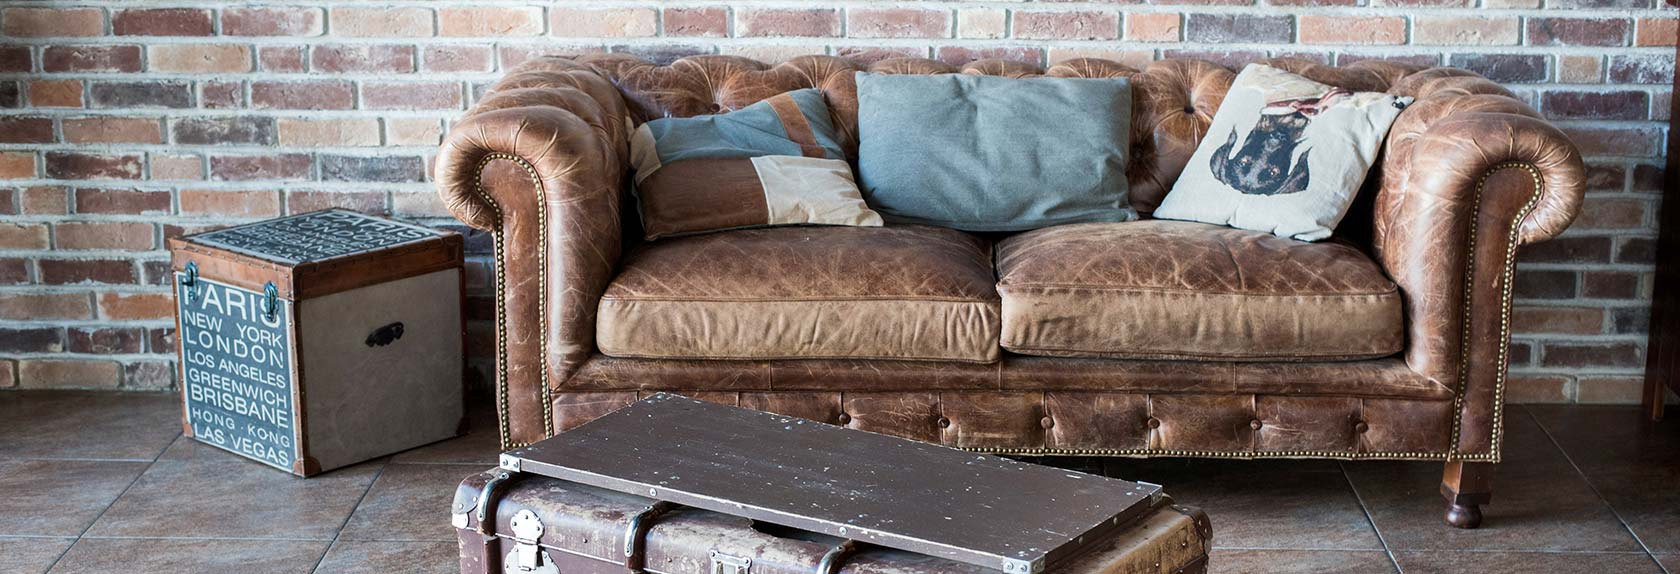 ledersofa neu beziehen preisvergleich auf 11880. Black Bedroom Furniture Sets. Home Design Ideas